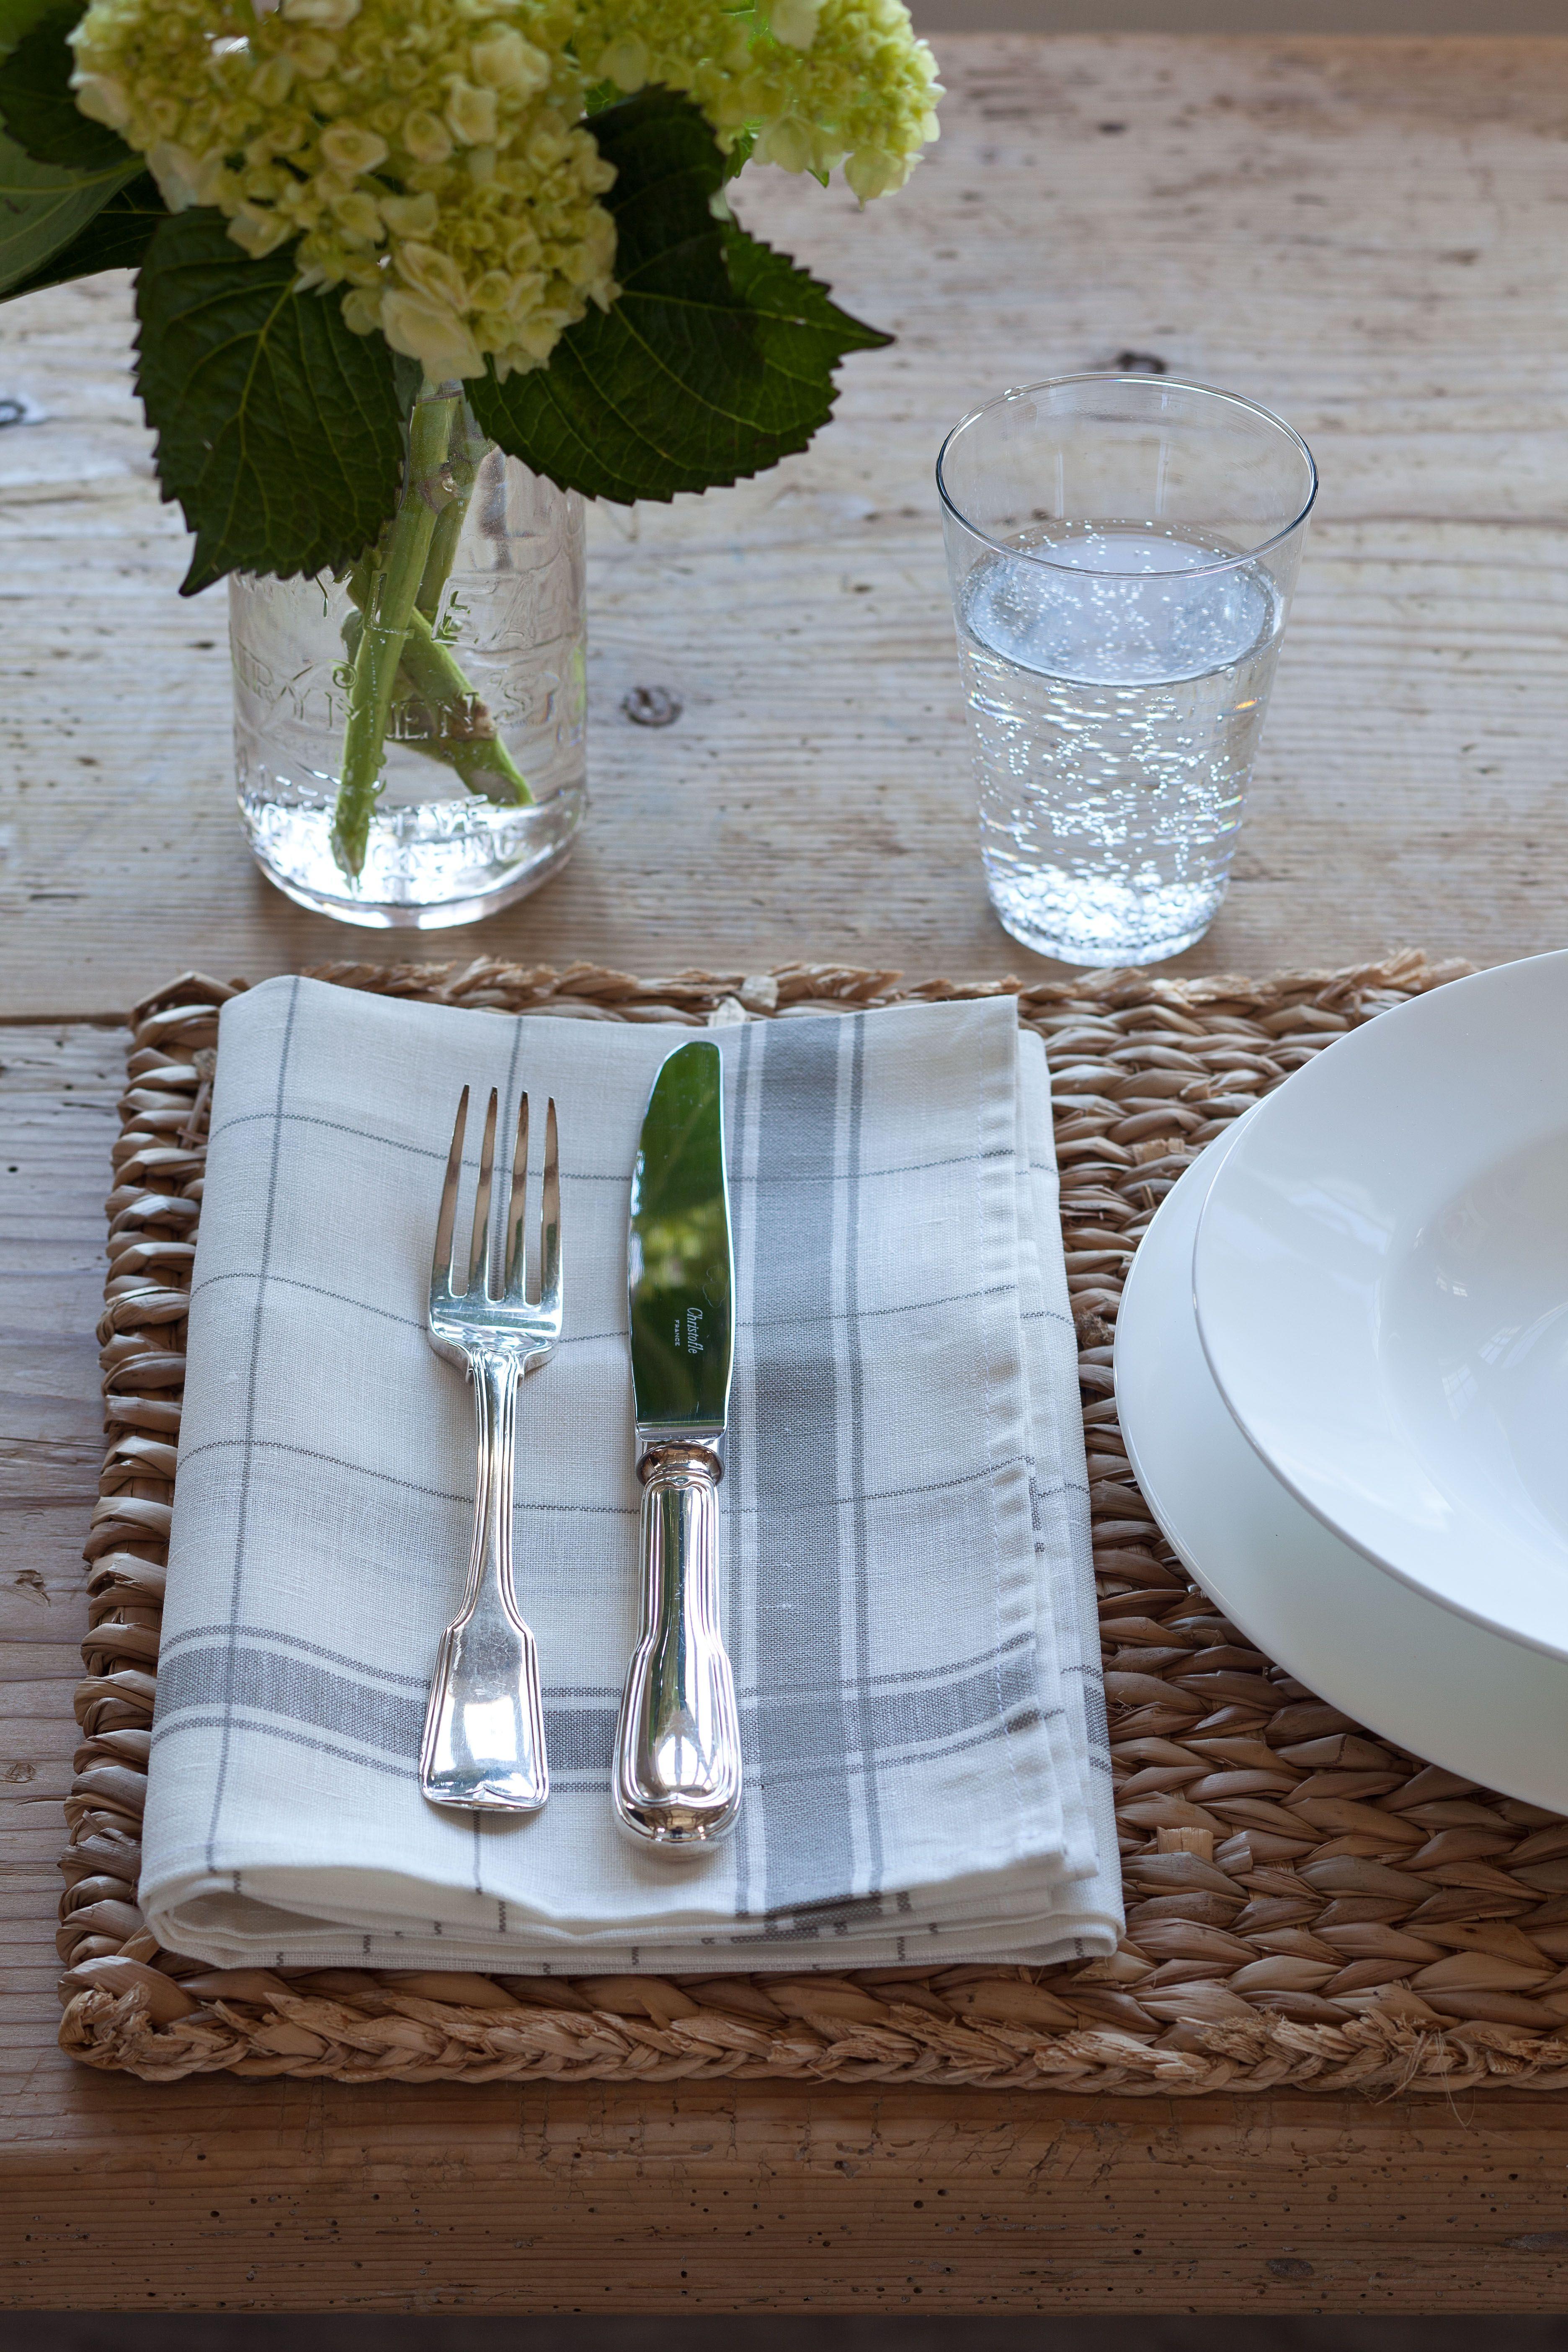 kitchen towels for casual napkins simplicity via ina garten - Ina Garten Pinterest